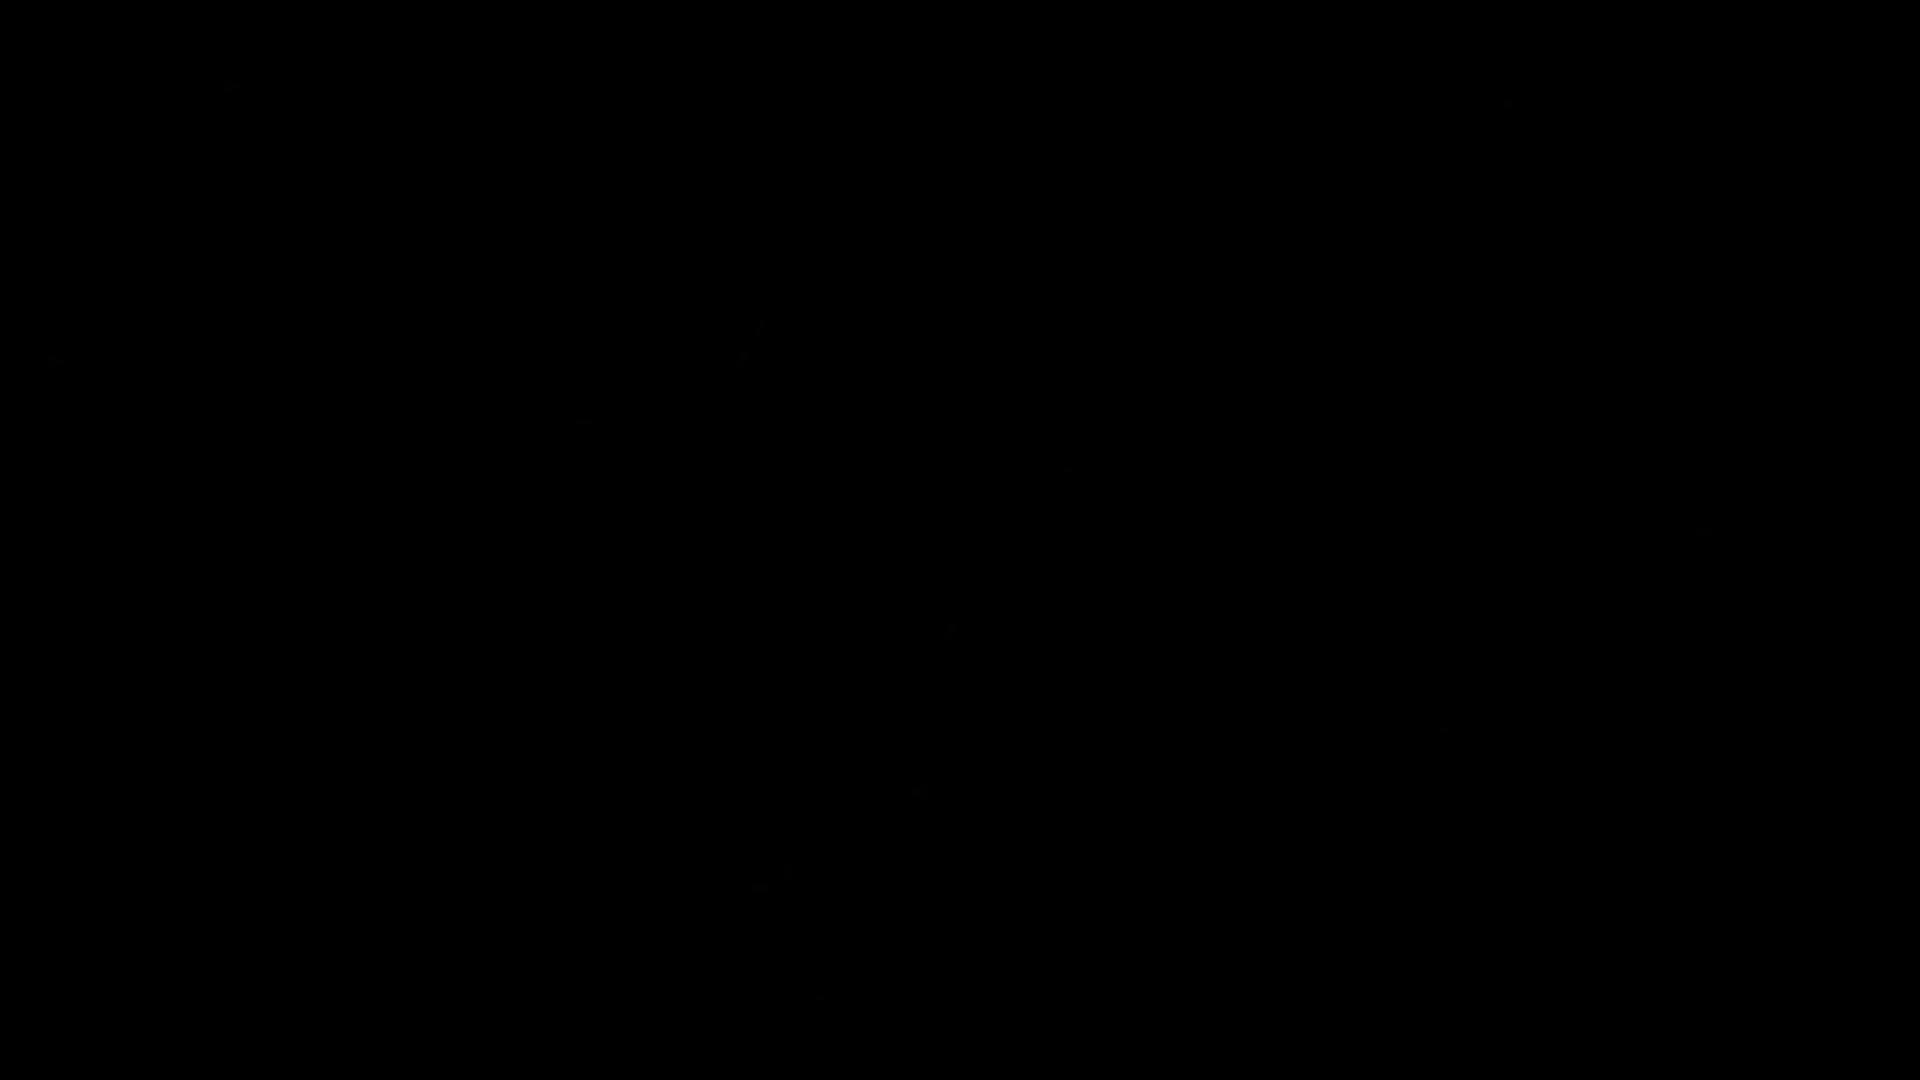 Autos & Vehicles, Kawasaki Ninja H2R, Suzuki Hayabusa, drag race, h2r ninja vs Hayabusa, hayabusa crazy acceleration, motorbikes drag racing, ninja kawasaki top speed, the fastest motorbikes 2019, wheels, H2 Ninja vs Hayabusa - motorcycles drag racing GIFs